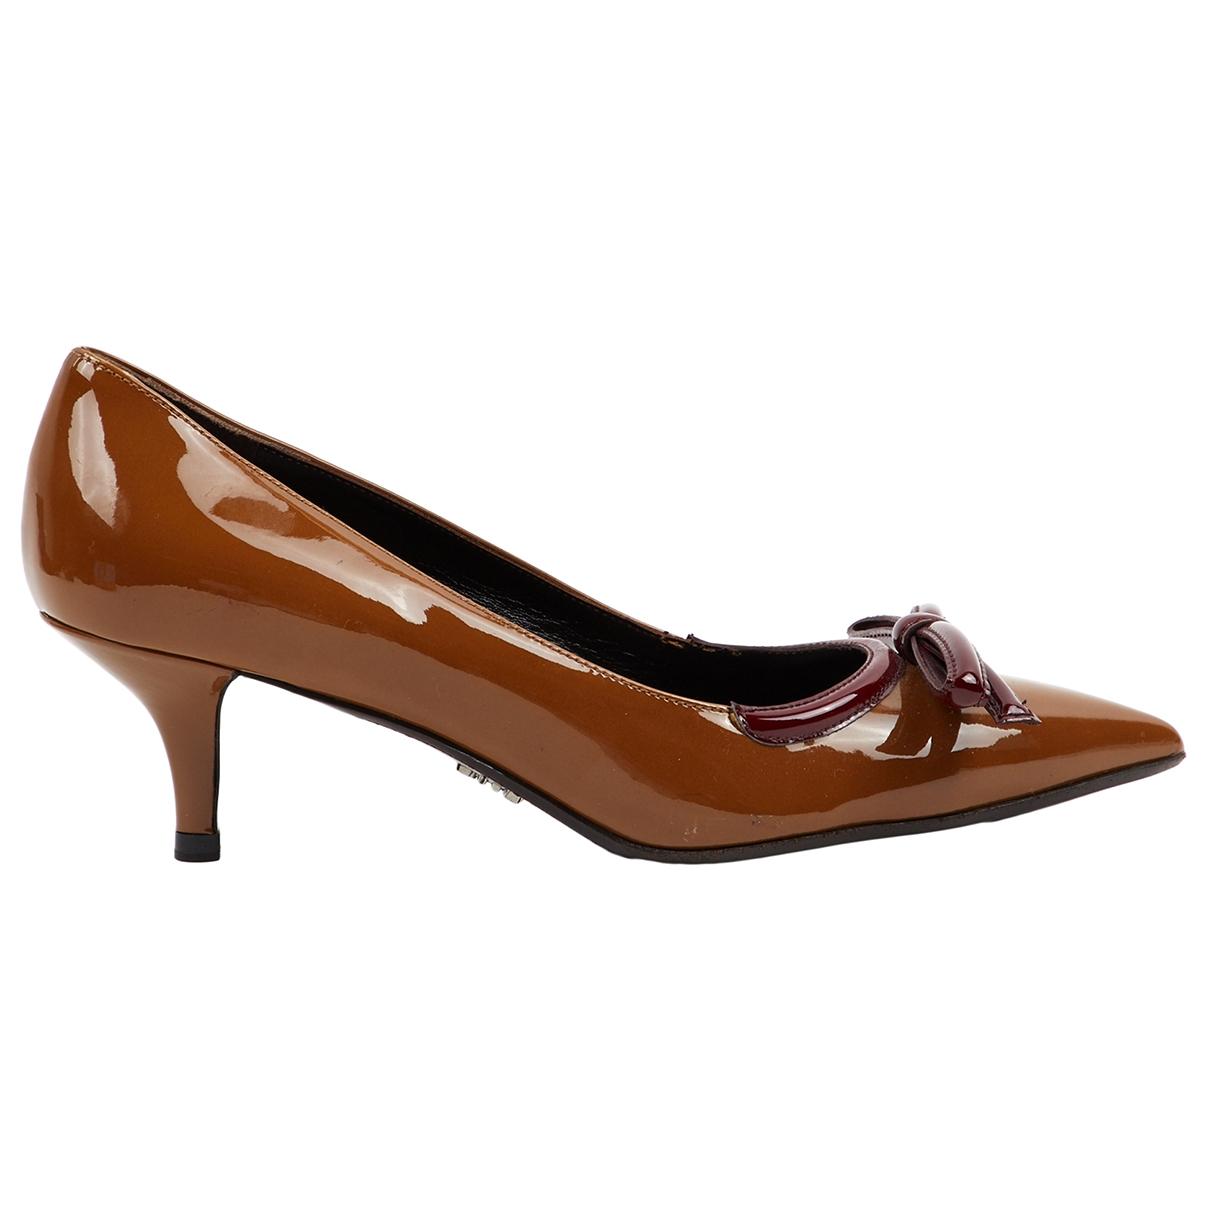 Prada - Escarpins   pour femme en cuir verni - marron